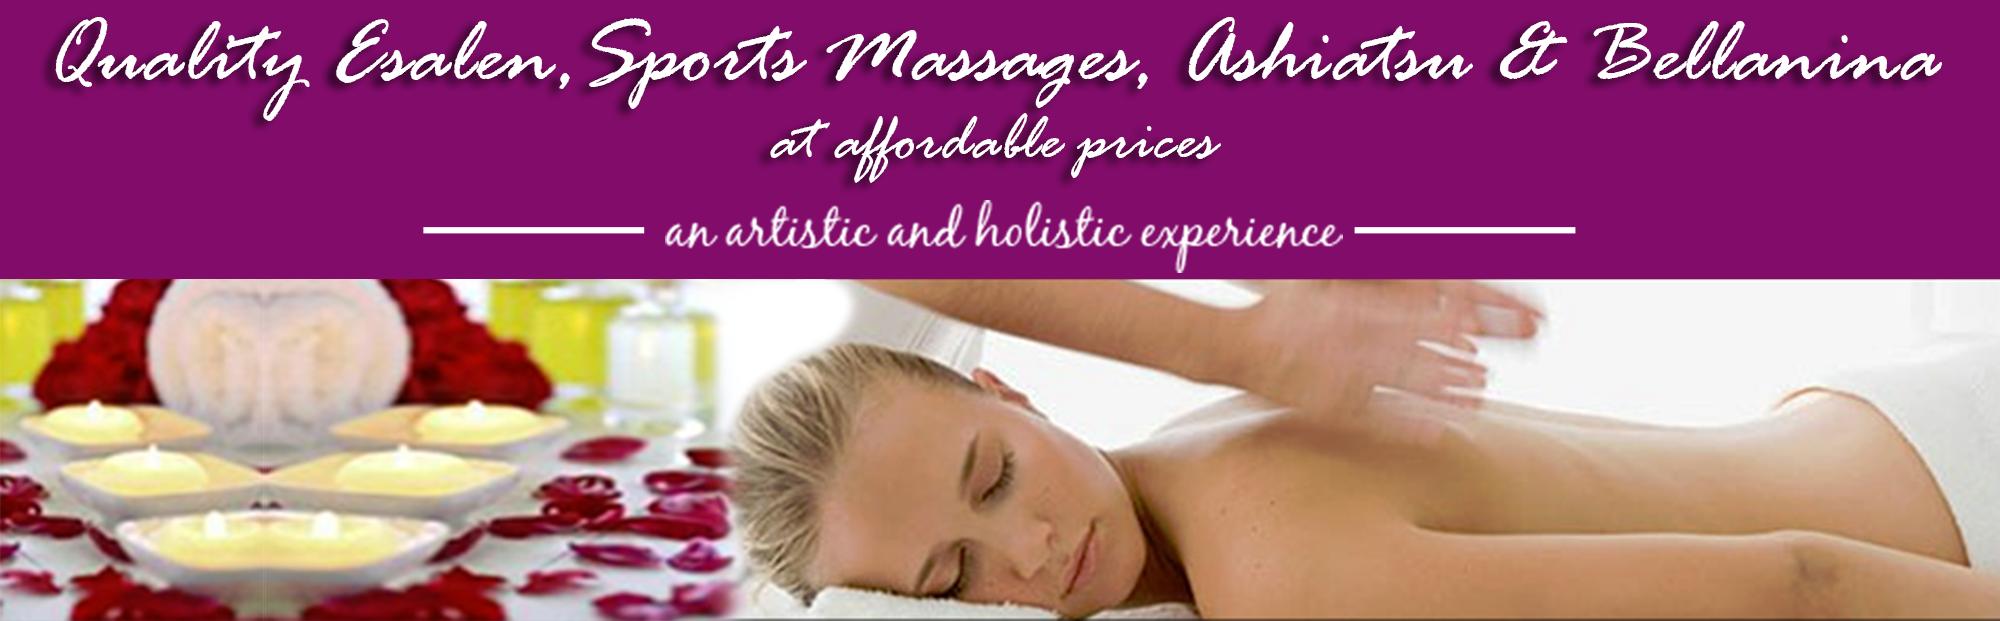 Spiritual Massage Fort Walton Beach